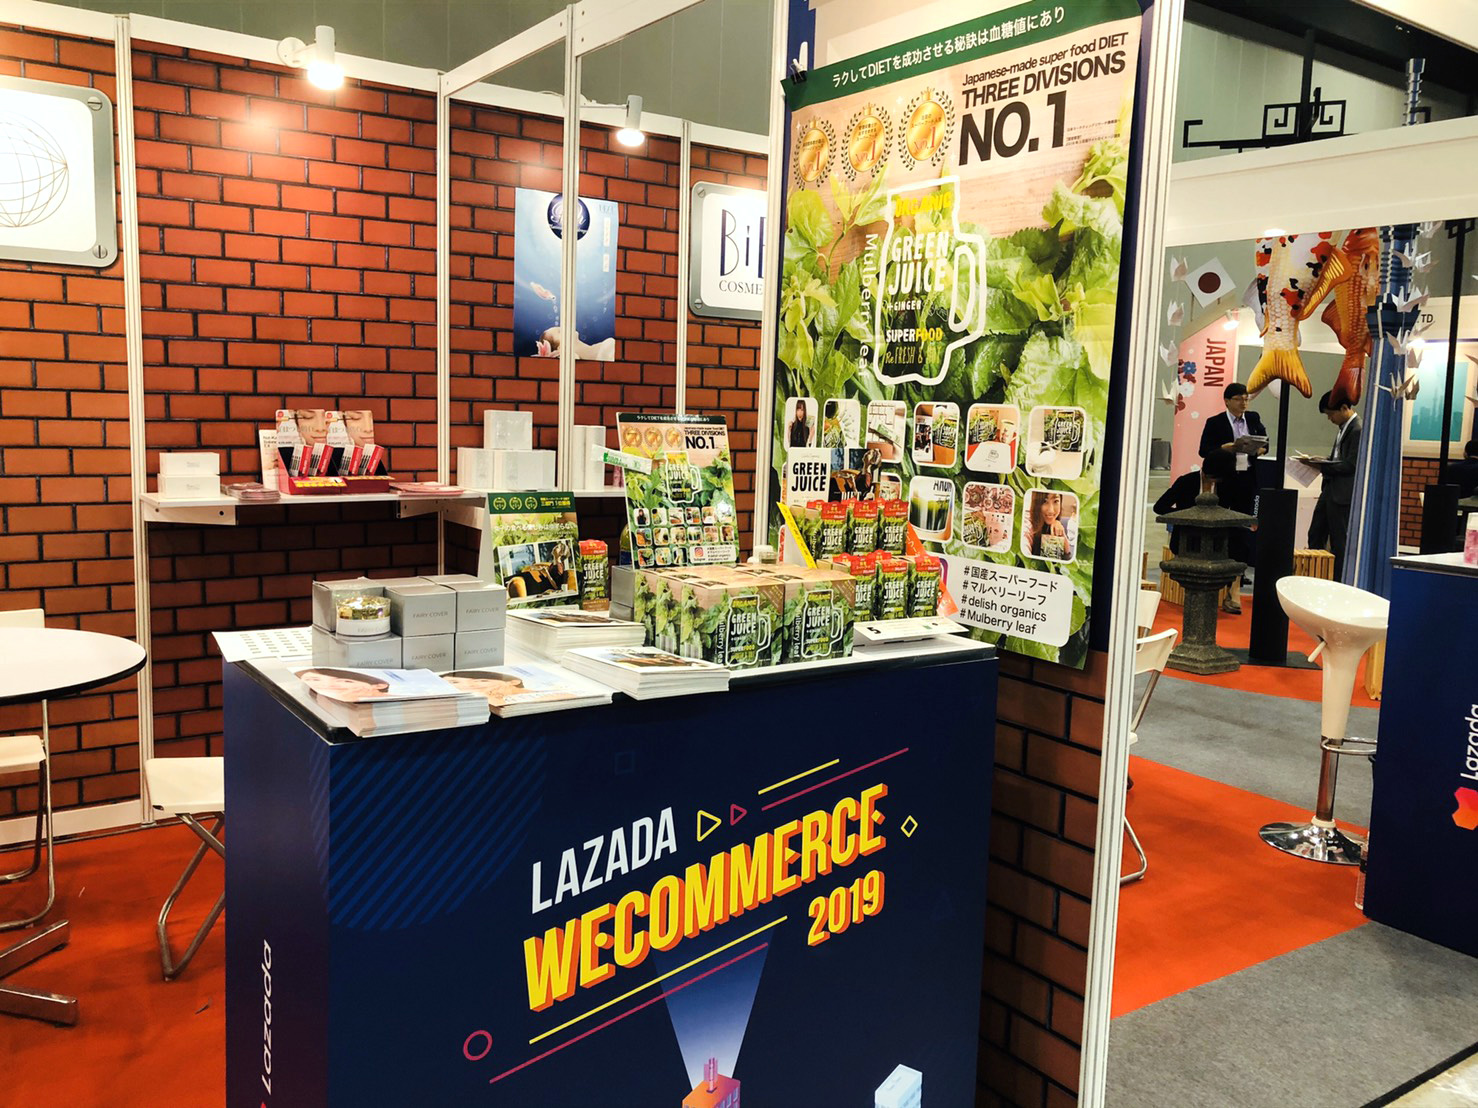 LAZADA_Wecommerce2019_009